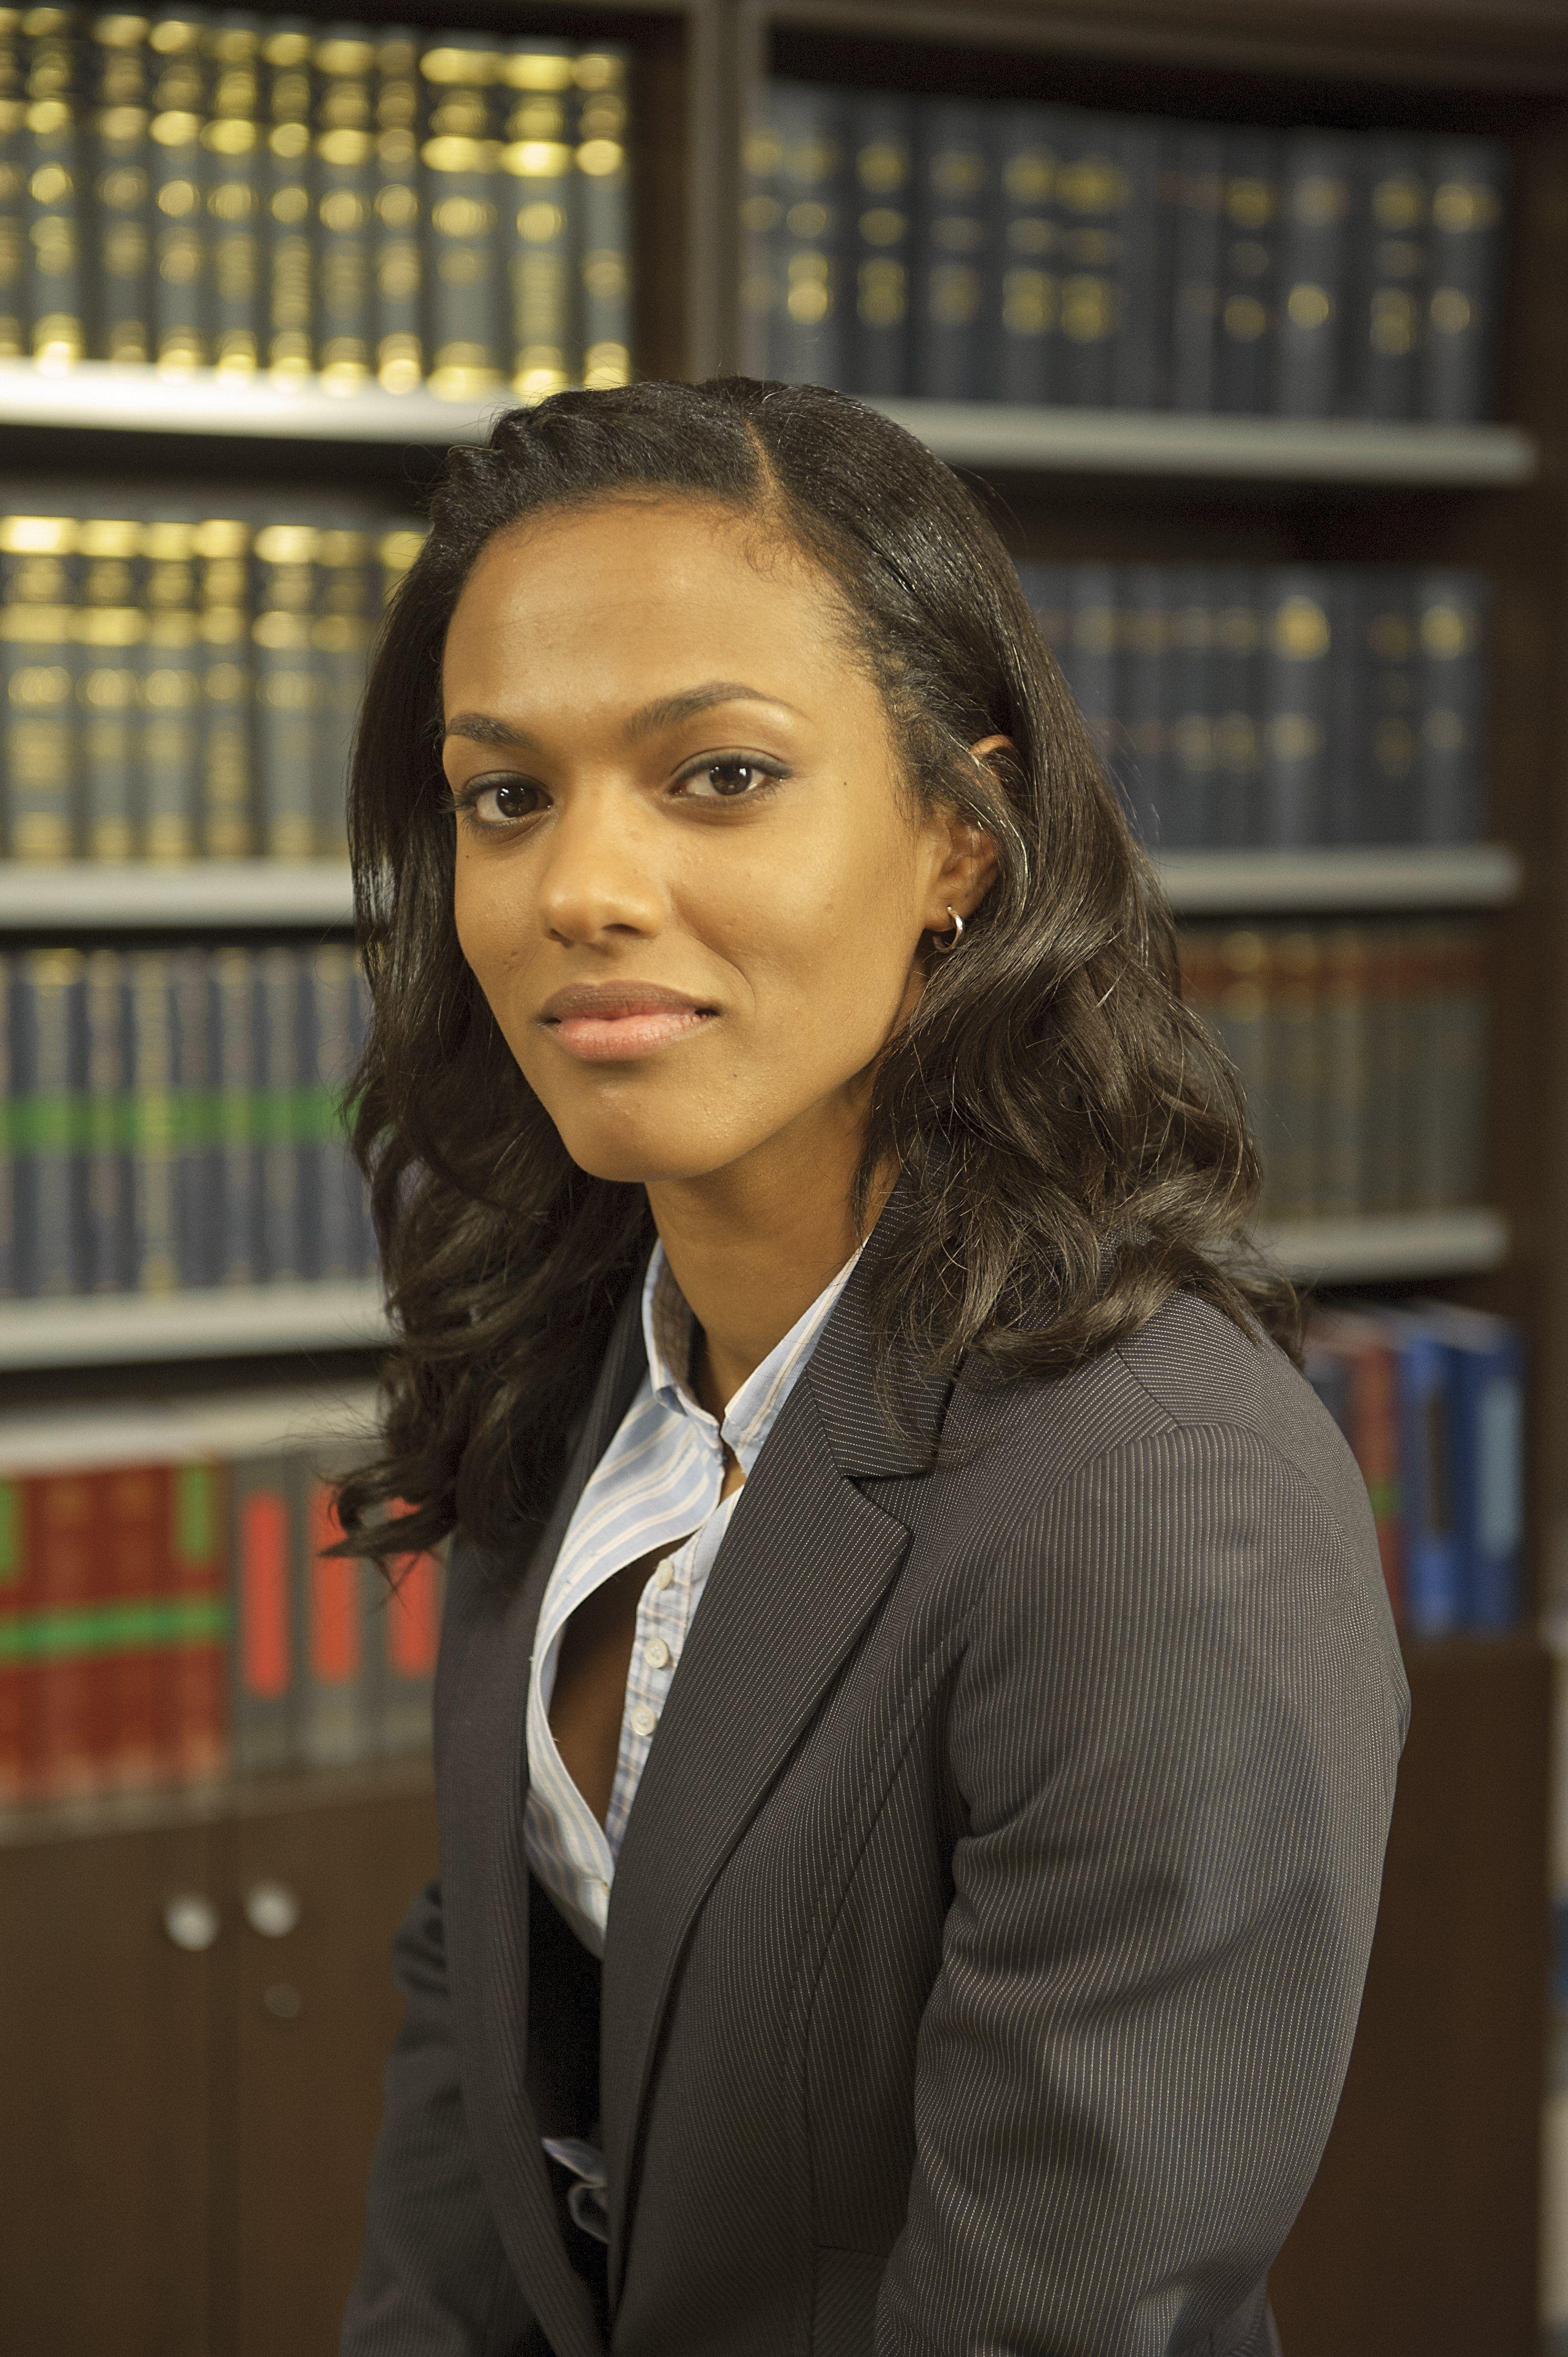 Law Order Uk Alesha Phillips Freema Agyeman Martha Jones Black Actresses Doctor Who Cast